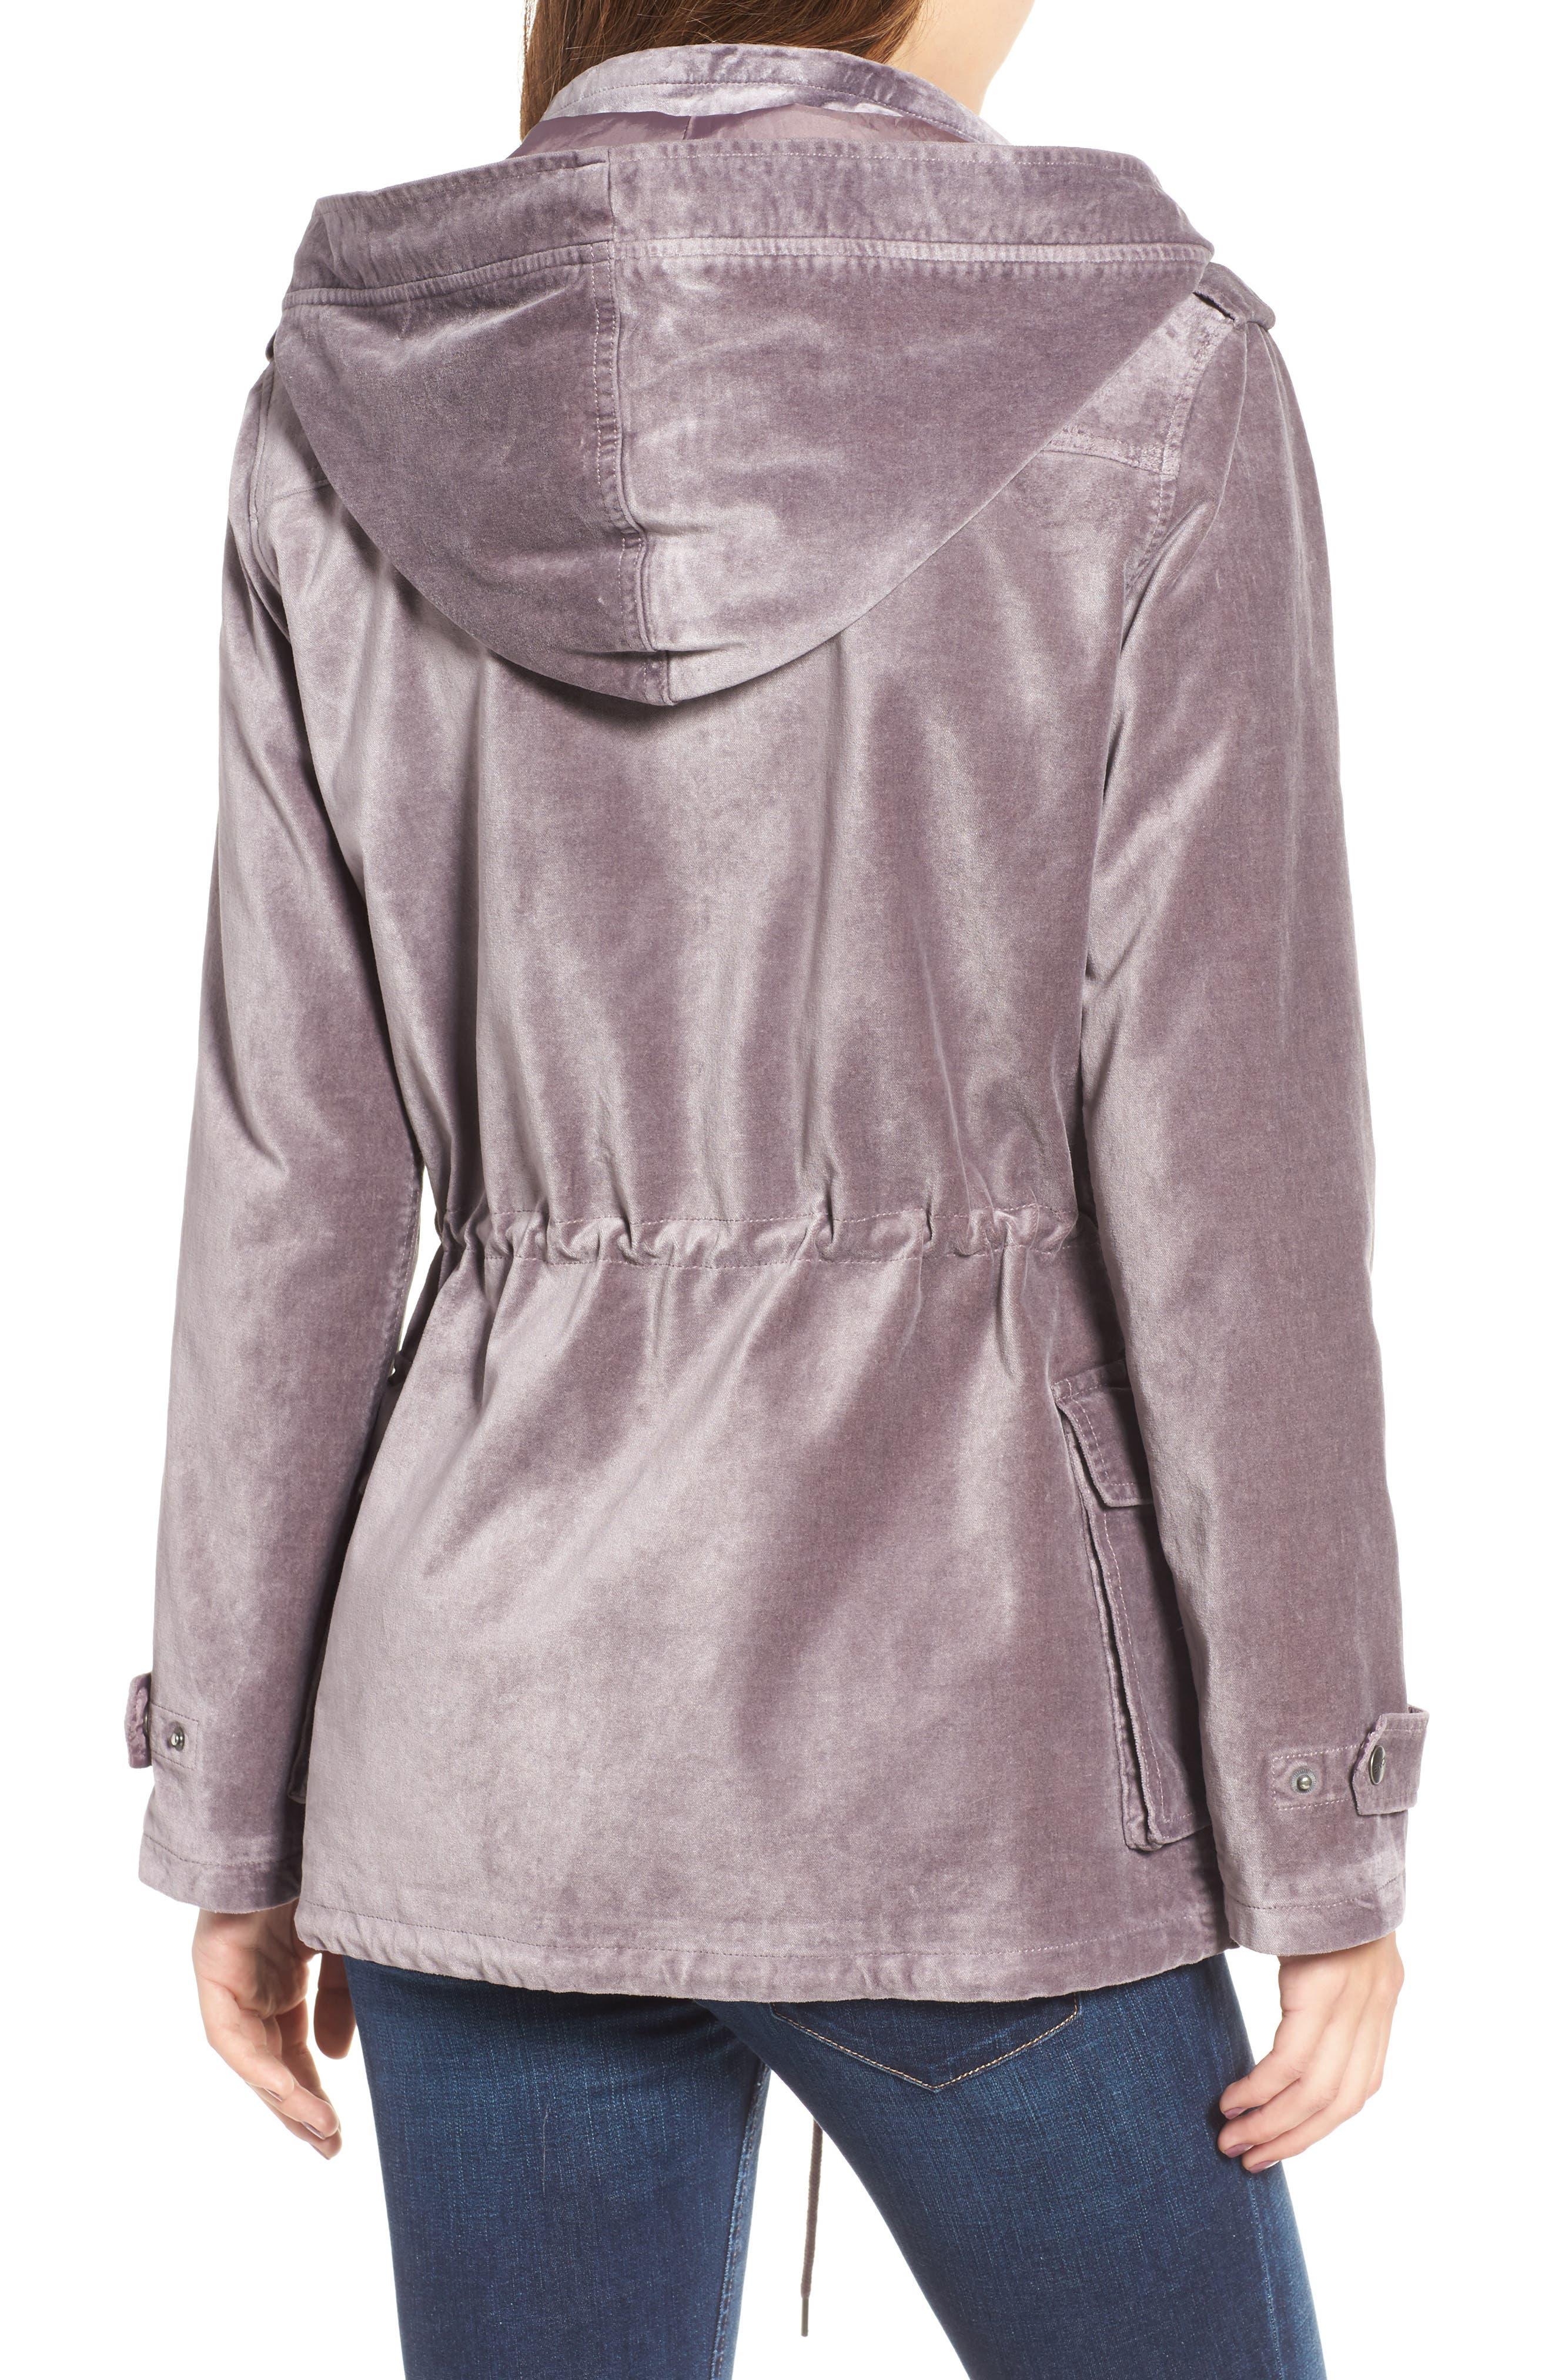 BNCI Cotton Velveteen Hooded Anorak Jacket,                             Alternate thumbnail 4, color,